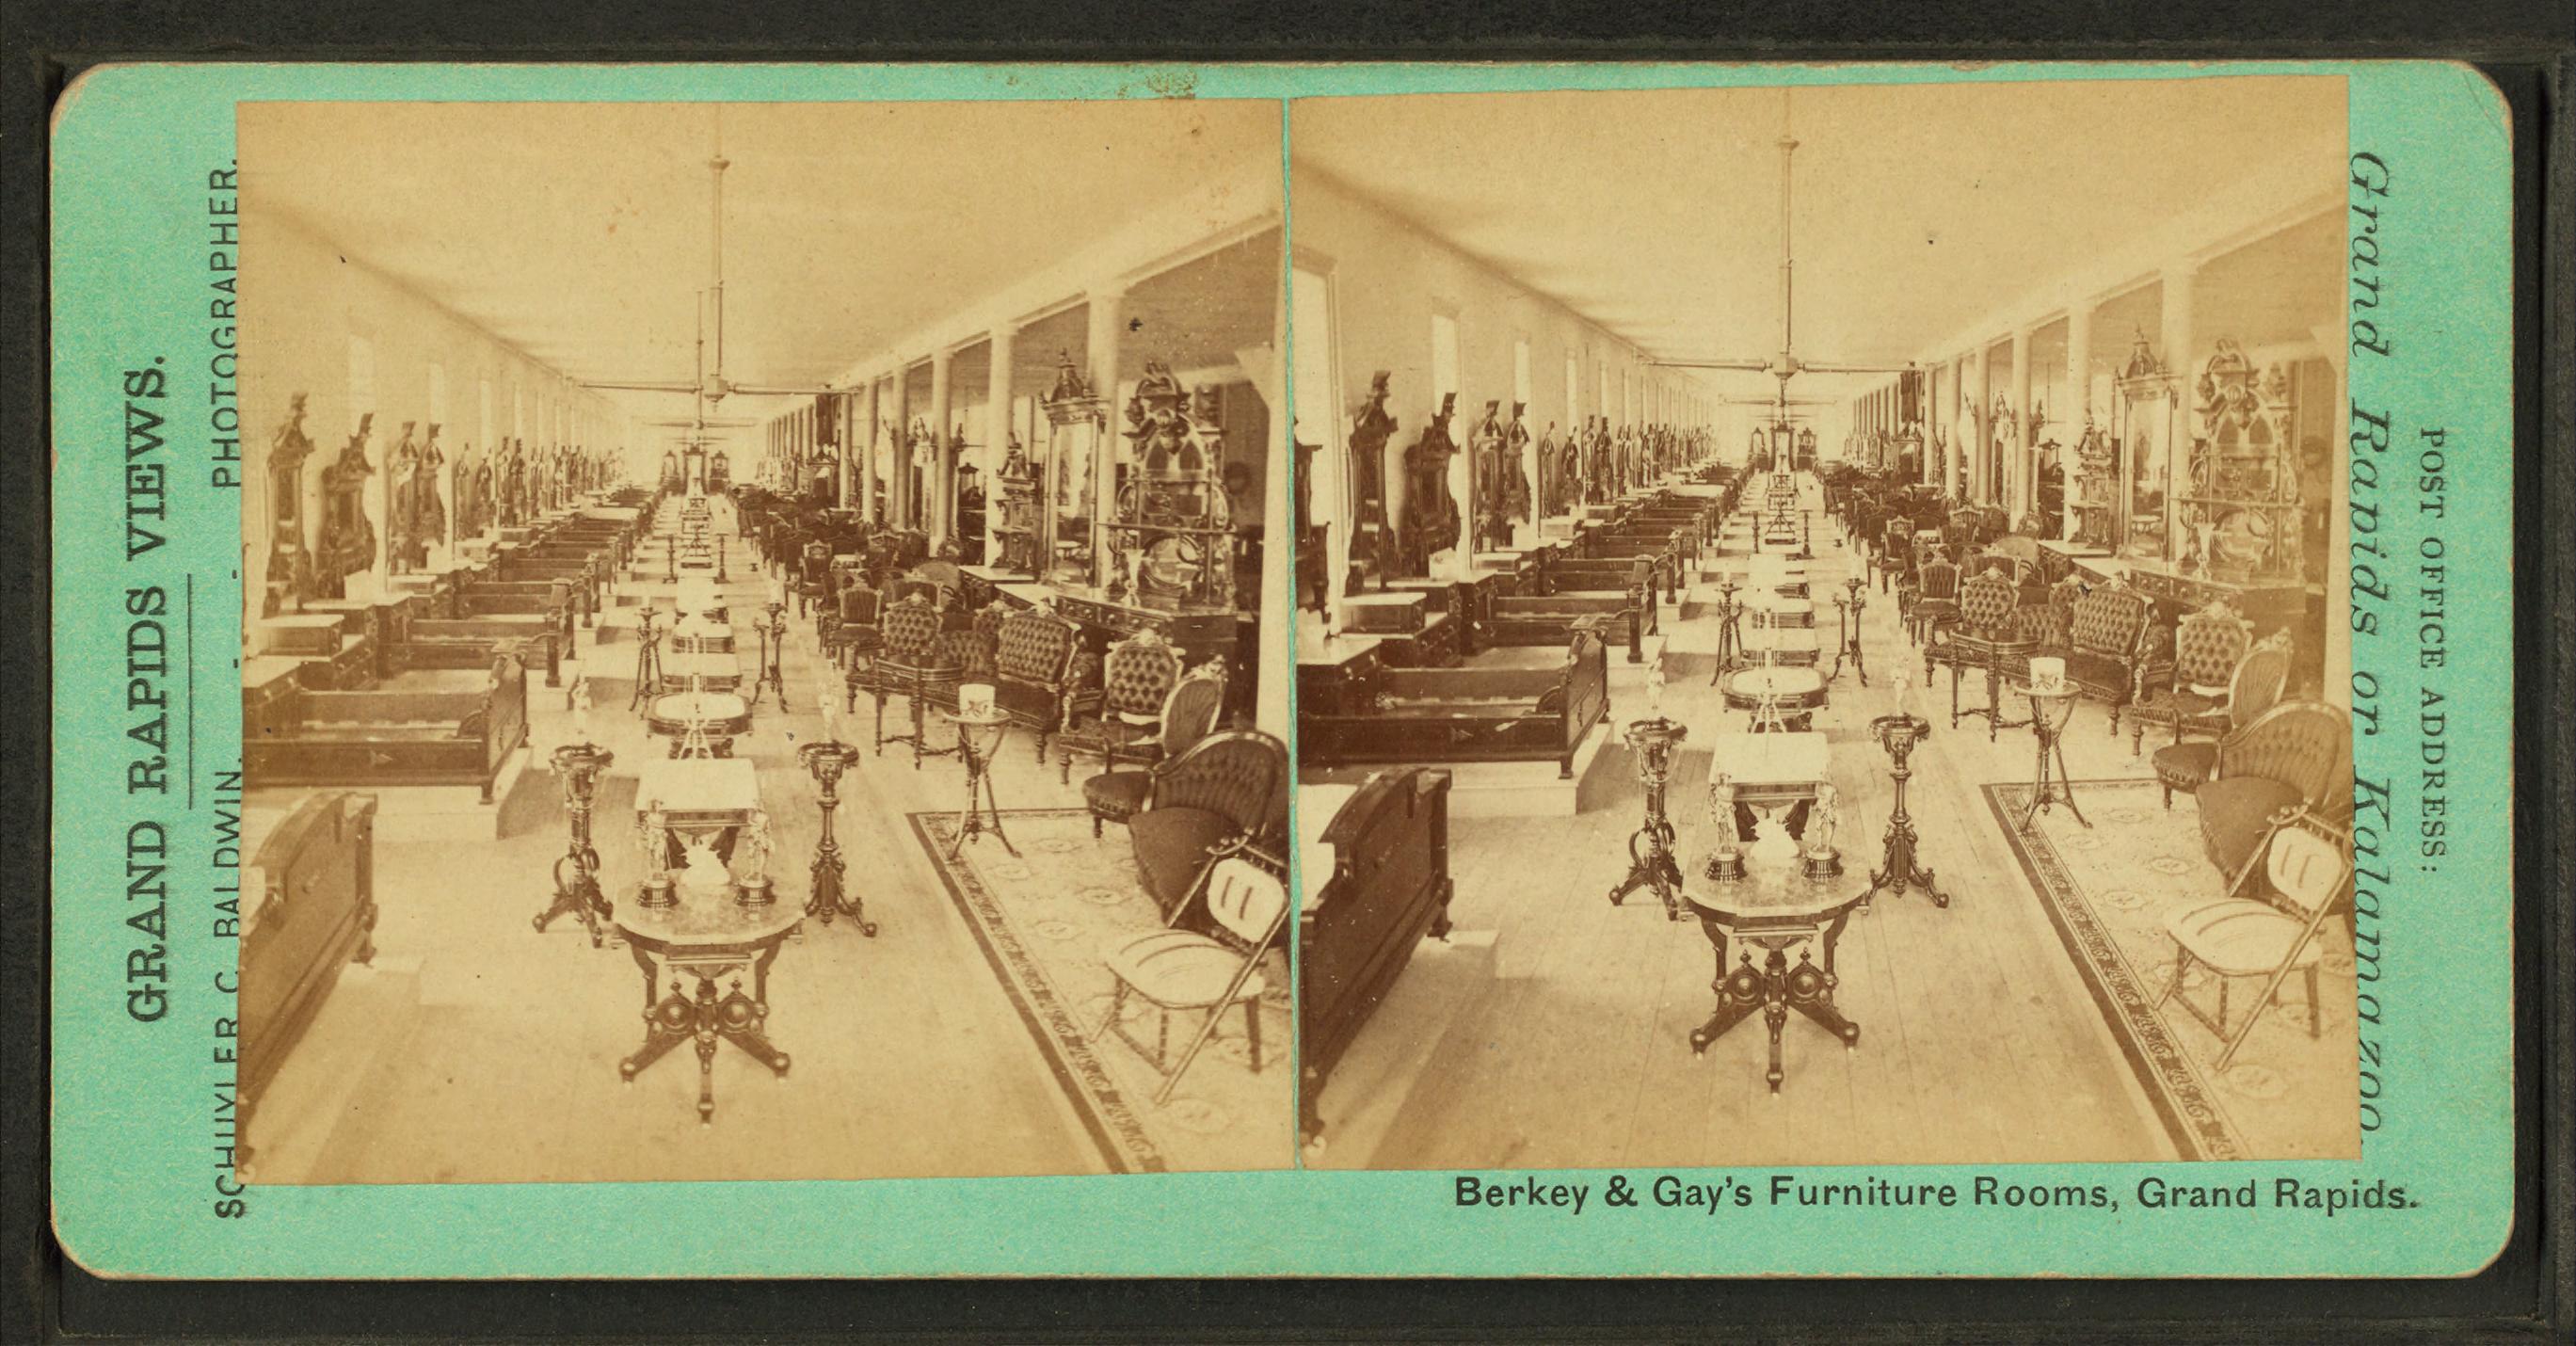 Berkey %26 Gay Furniture rooms, Grand Rapids, Michigan, by Baldwin, Schuyler C. (Schuyler Colfax), 1823 1900 gay clothing optional hotels las vegas